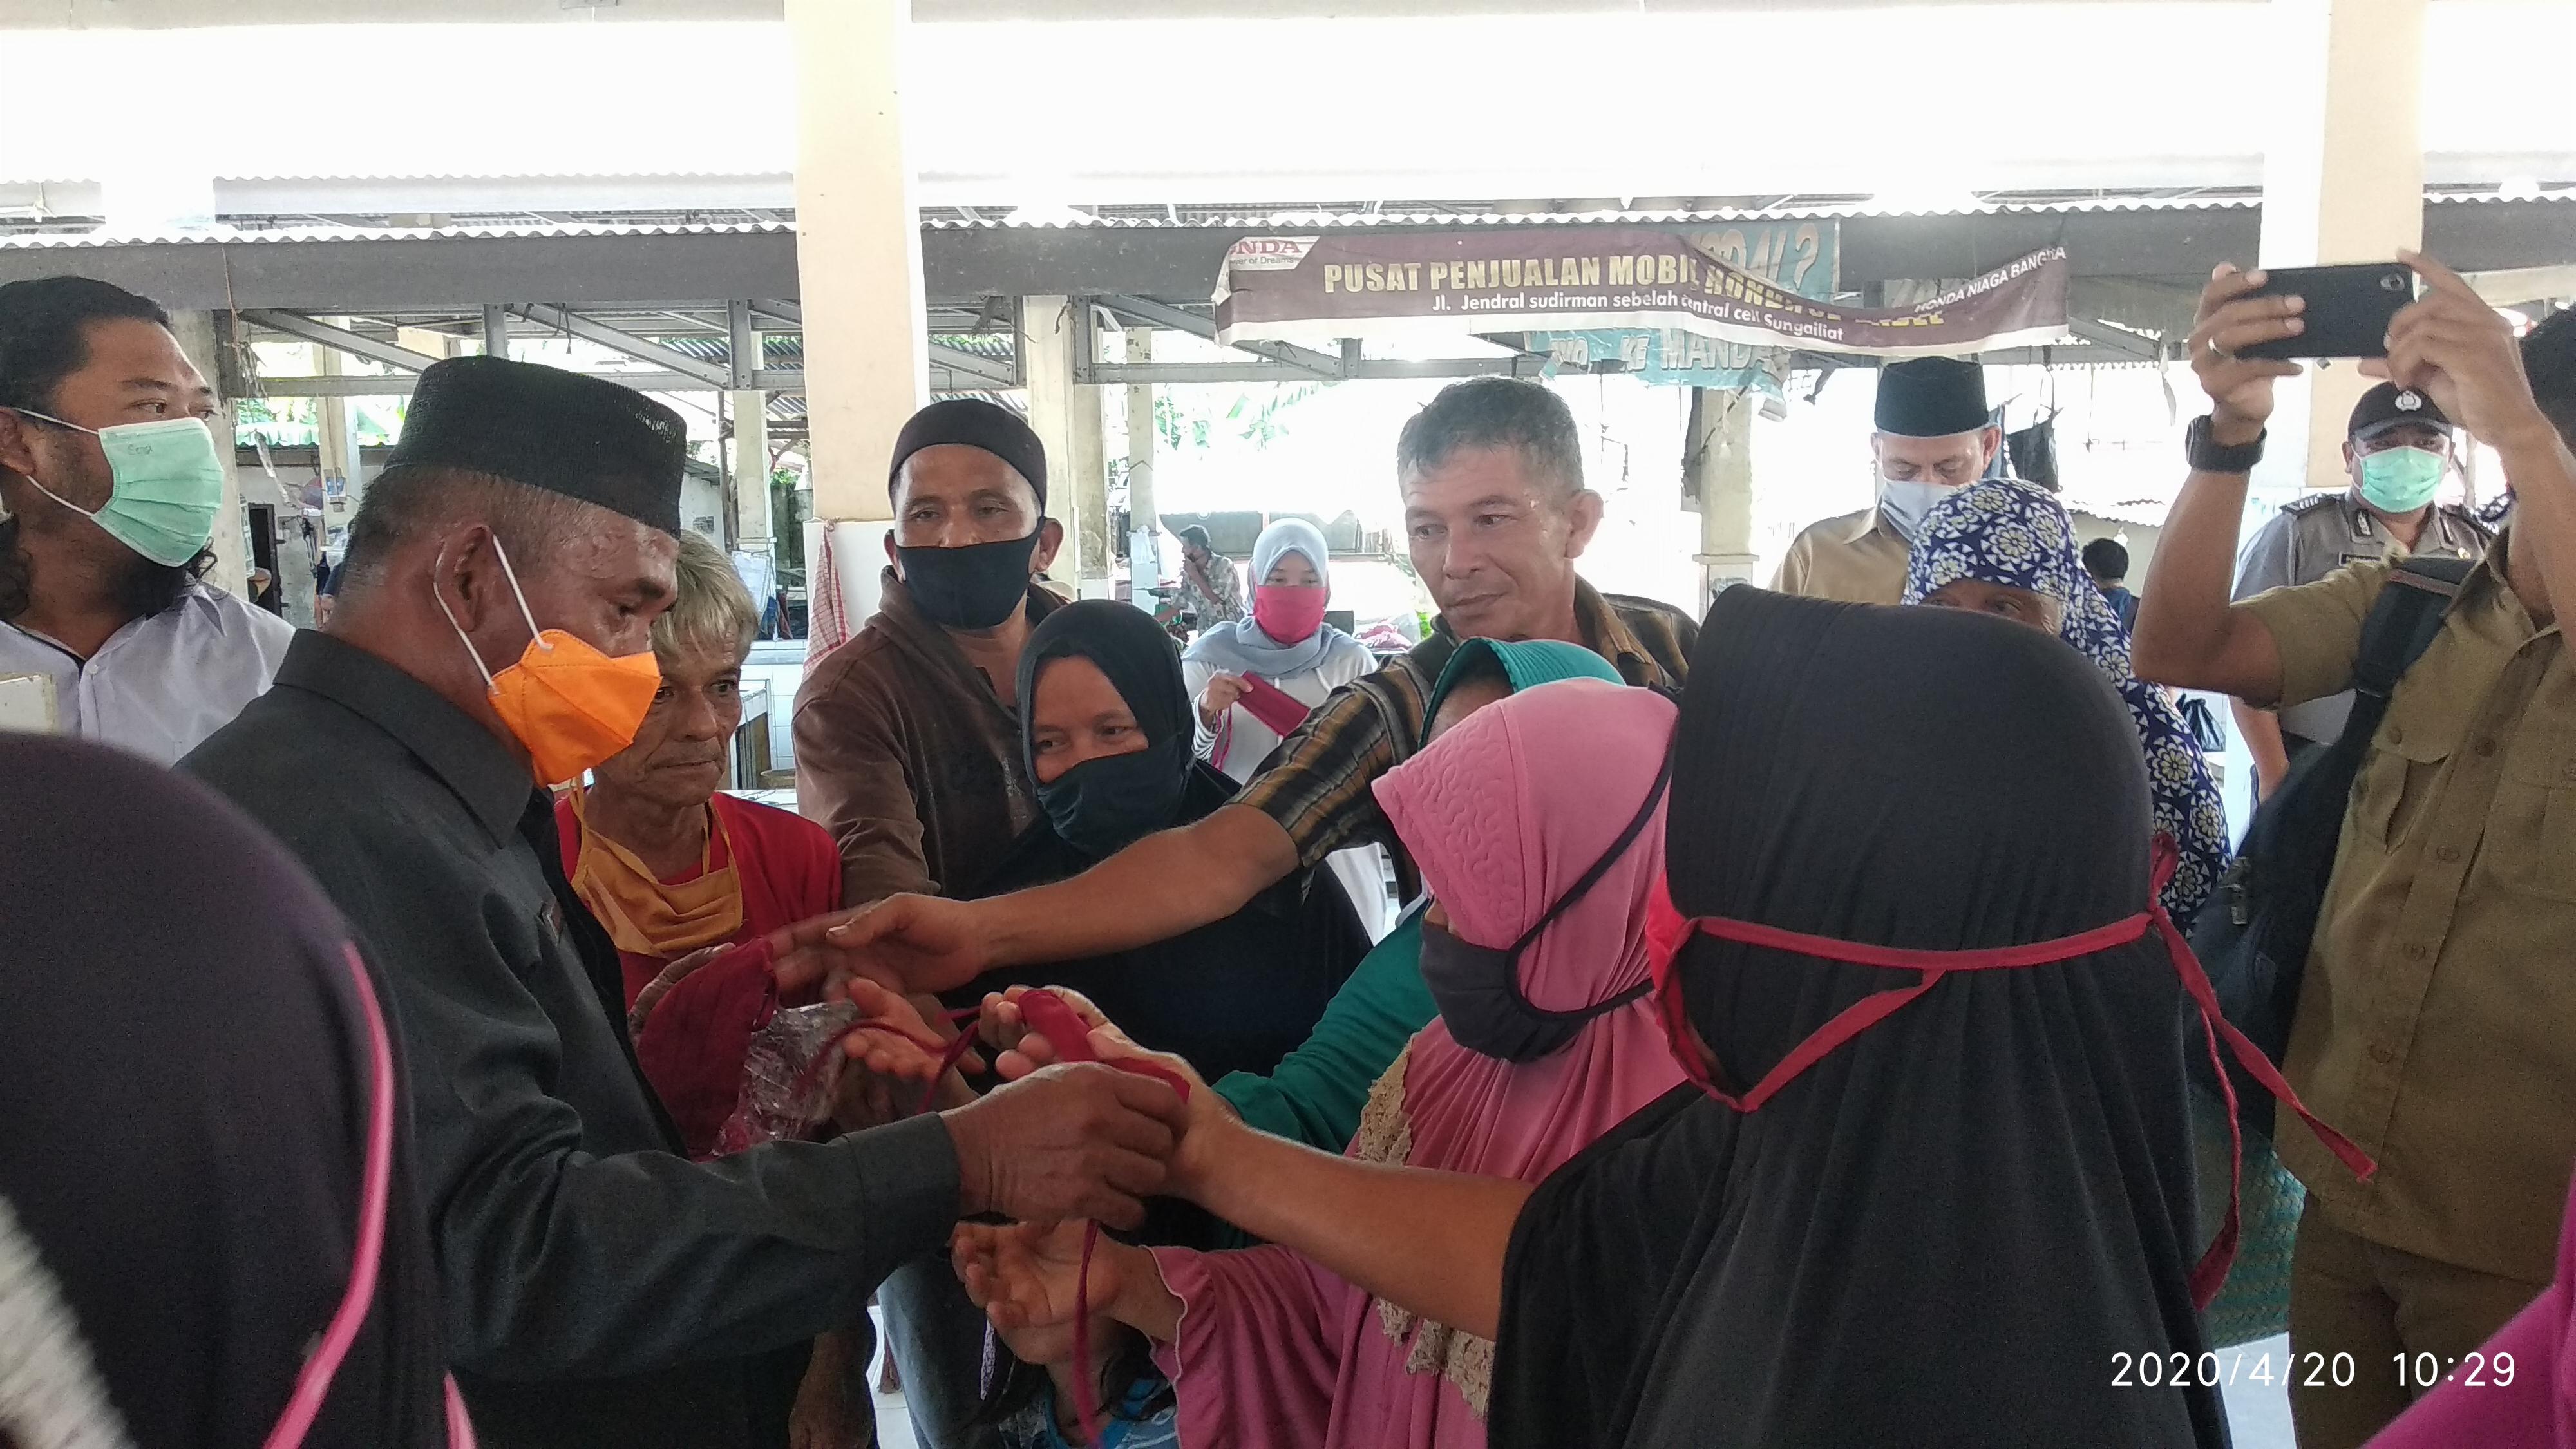 Ketua DPRD Bangka Bagikan 500 Masker Buatan Penjahit Lokal